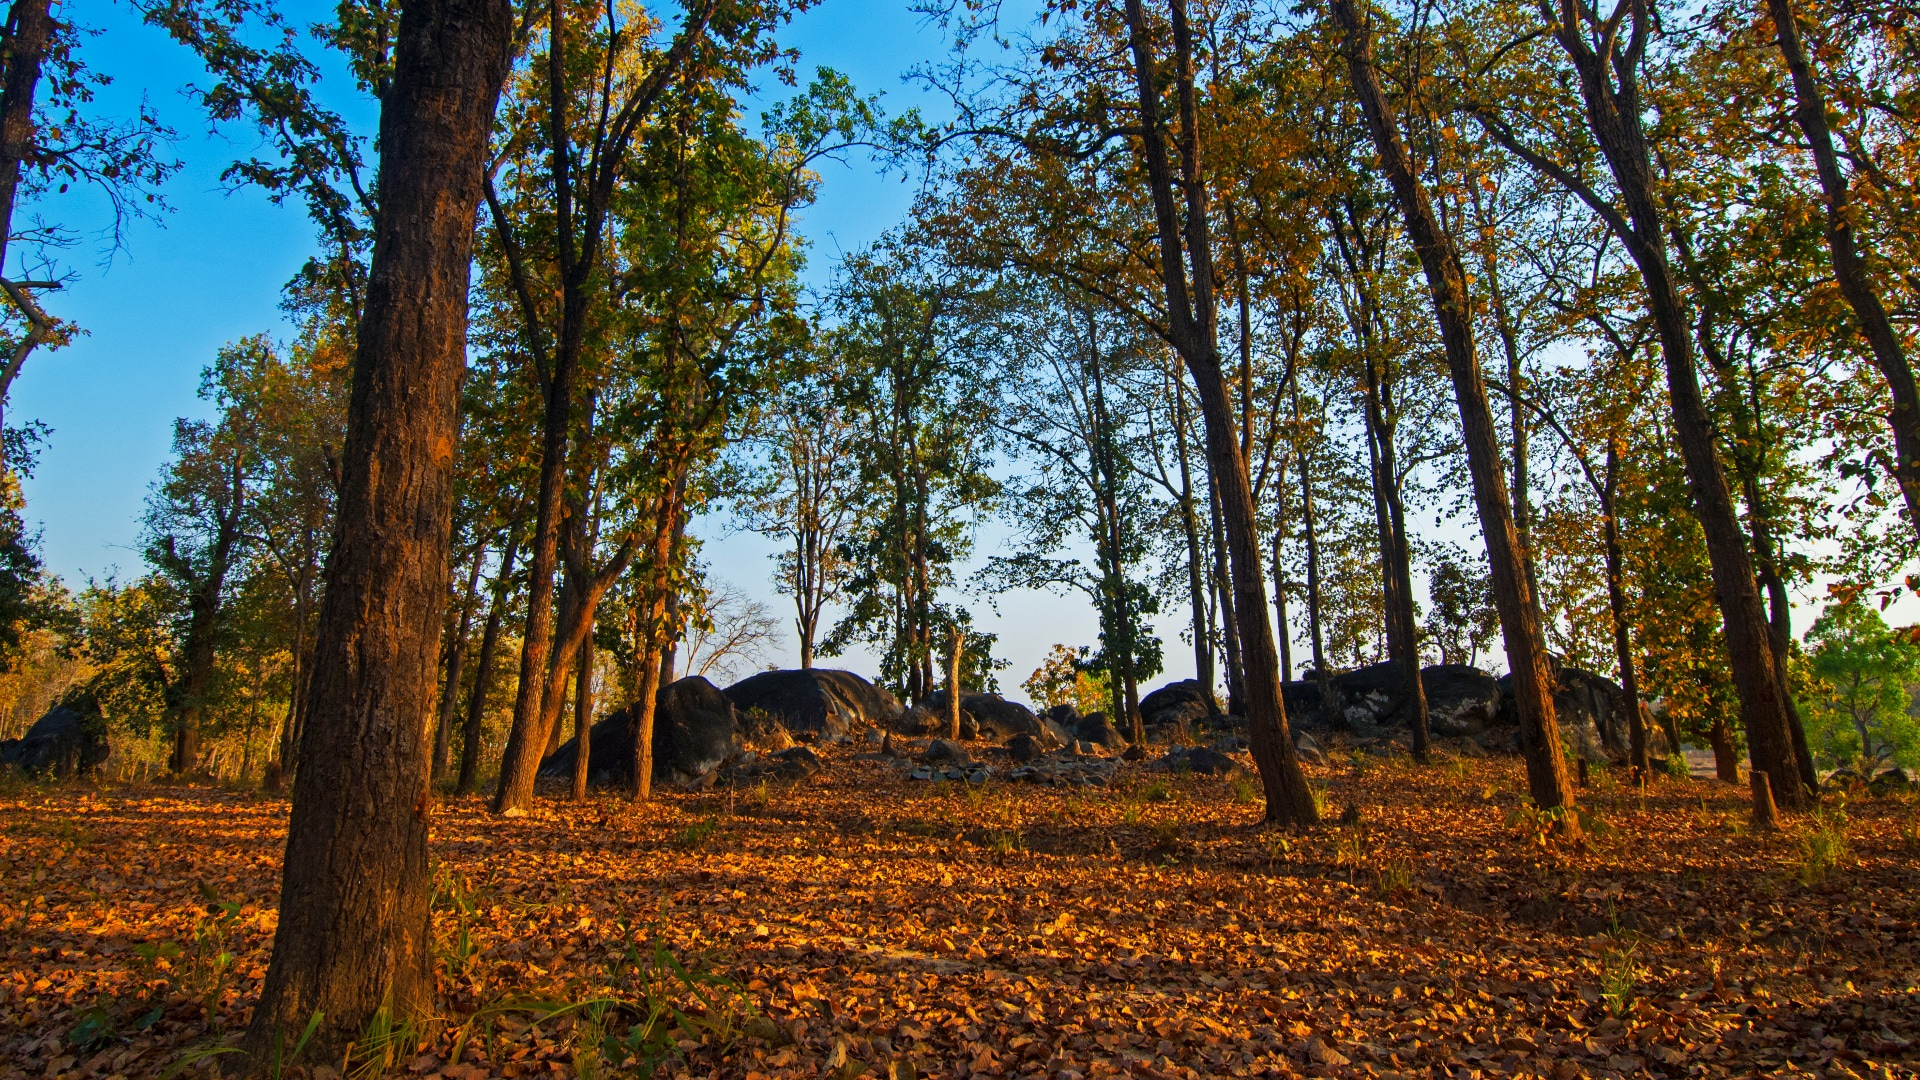 The Guide: Kanha National Park